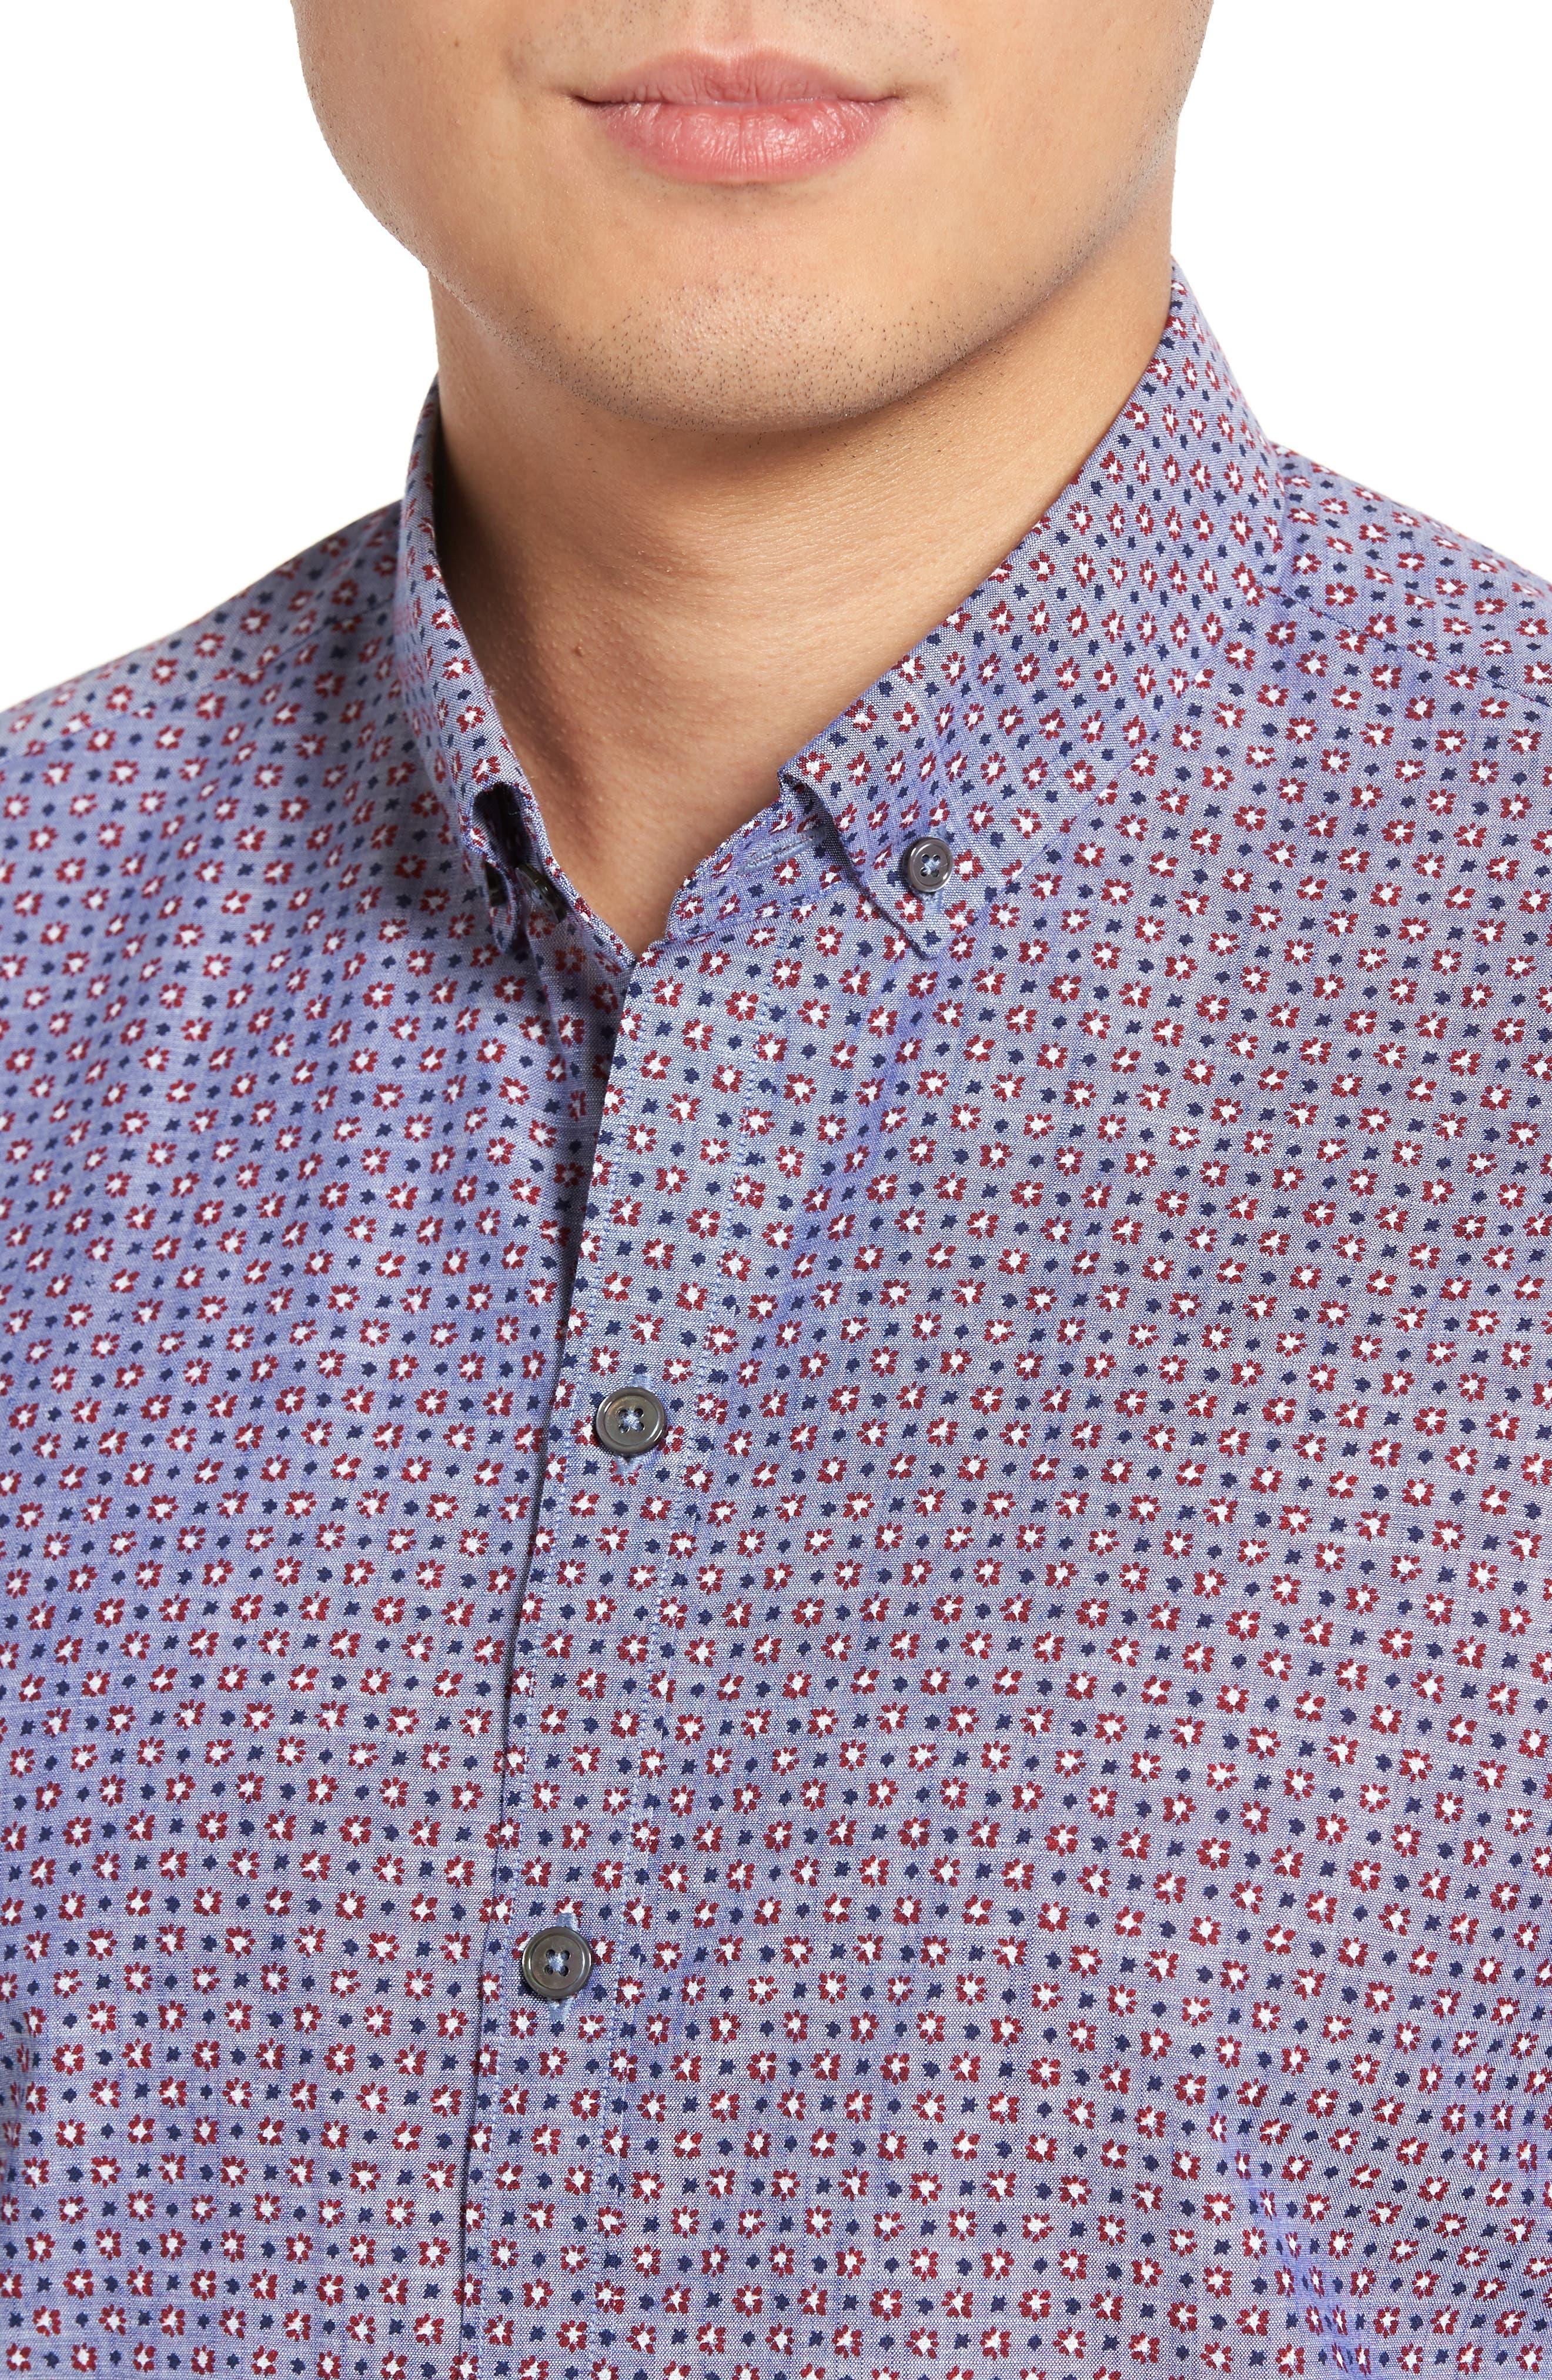 Chernow Trim Fit Print Sport Shirt,                             Alternate thumbnail 4, color,                             Denim